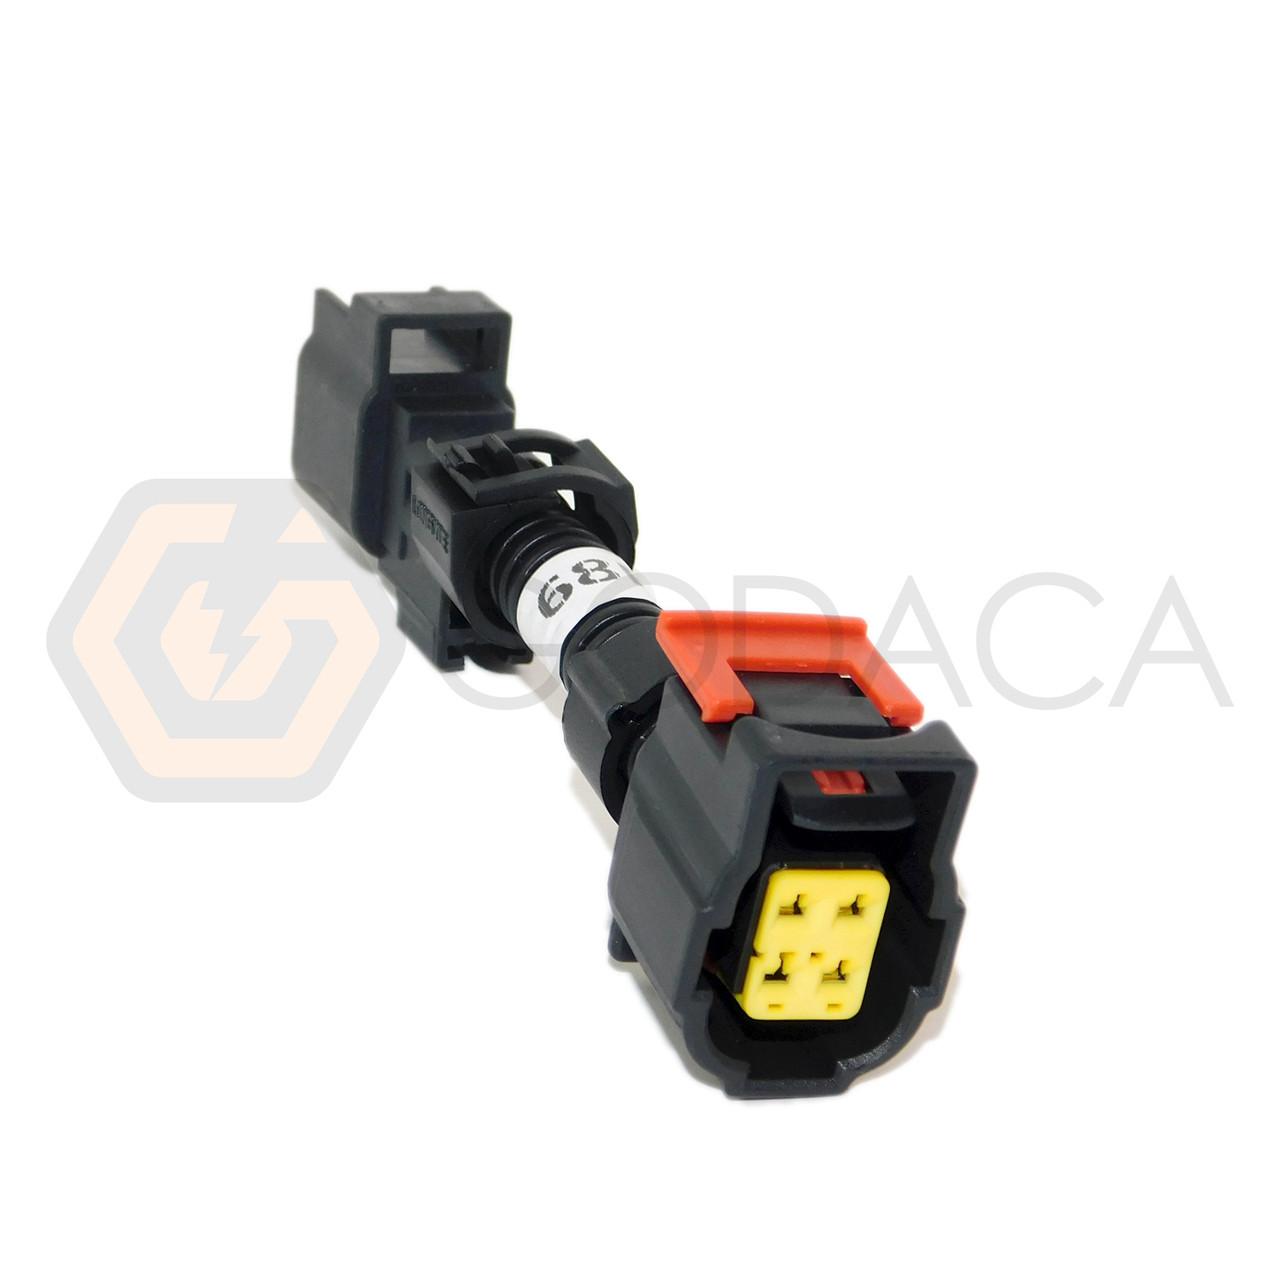 medium resolution of 1x wiring harness for dodge chrysler transmission line pressure booster 68rfe godaca llc